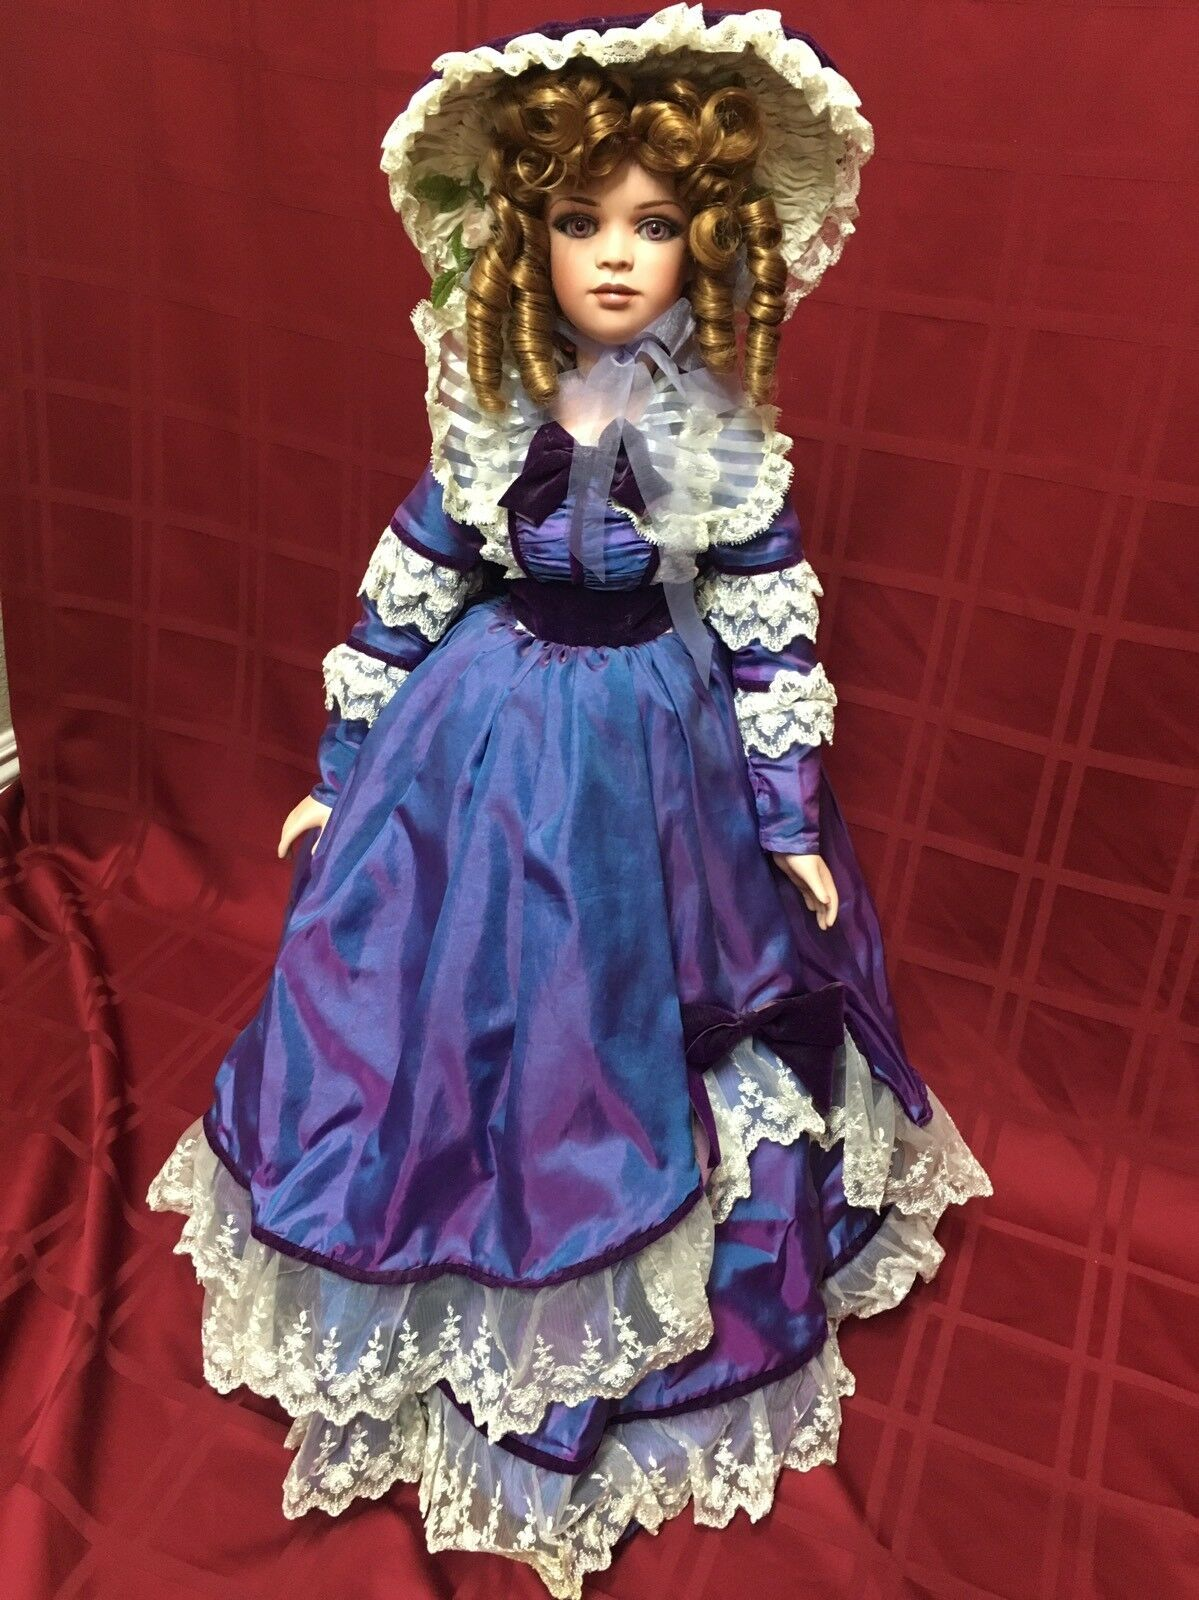 Jan Mclean Designs Young Girl 1998 397/1000 29  Porcelain Doll Iridescent viola